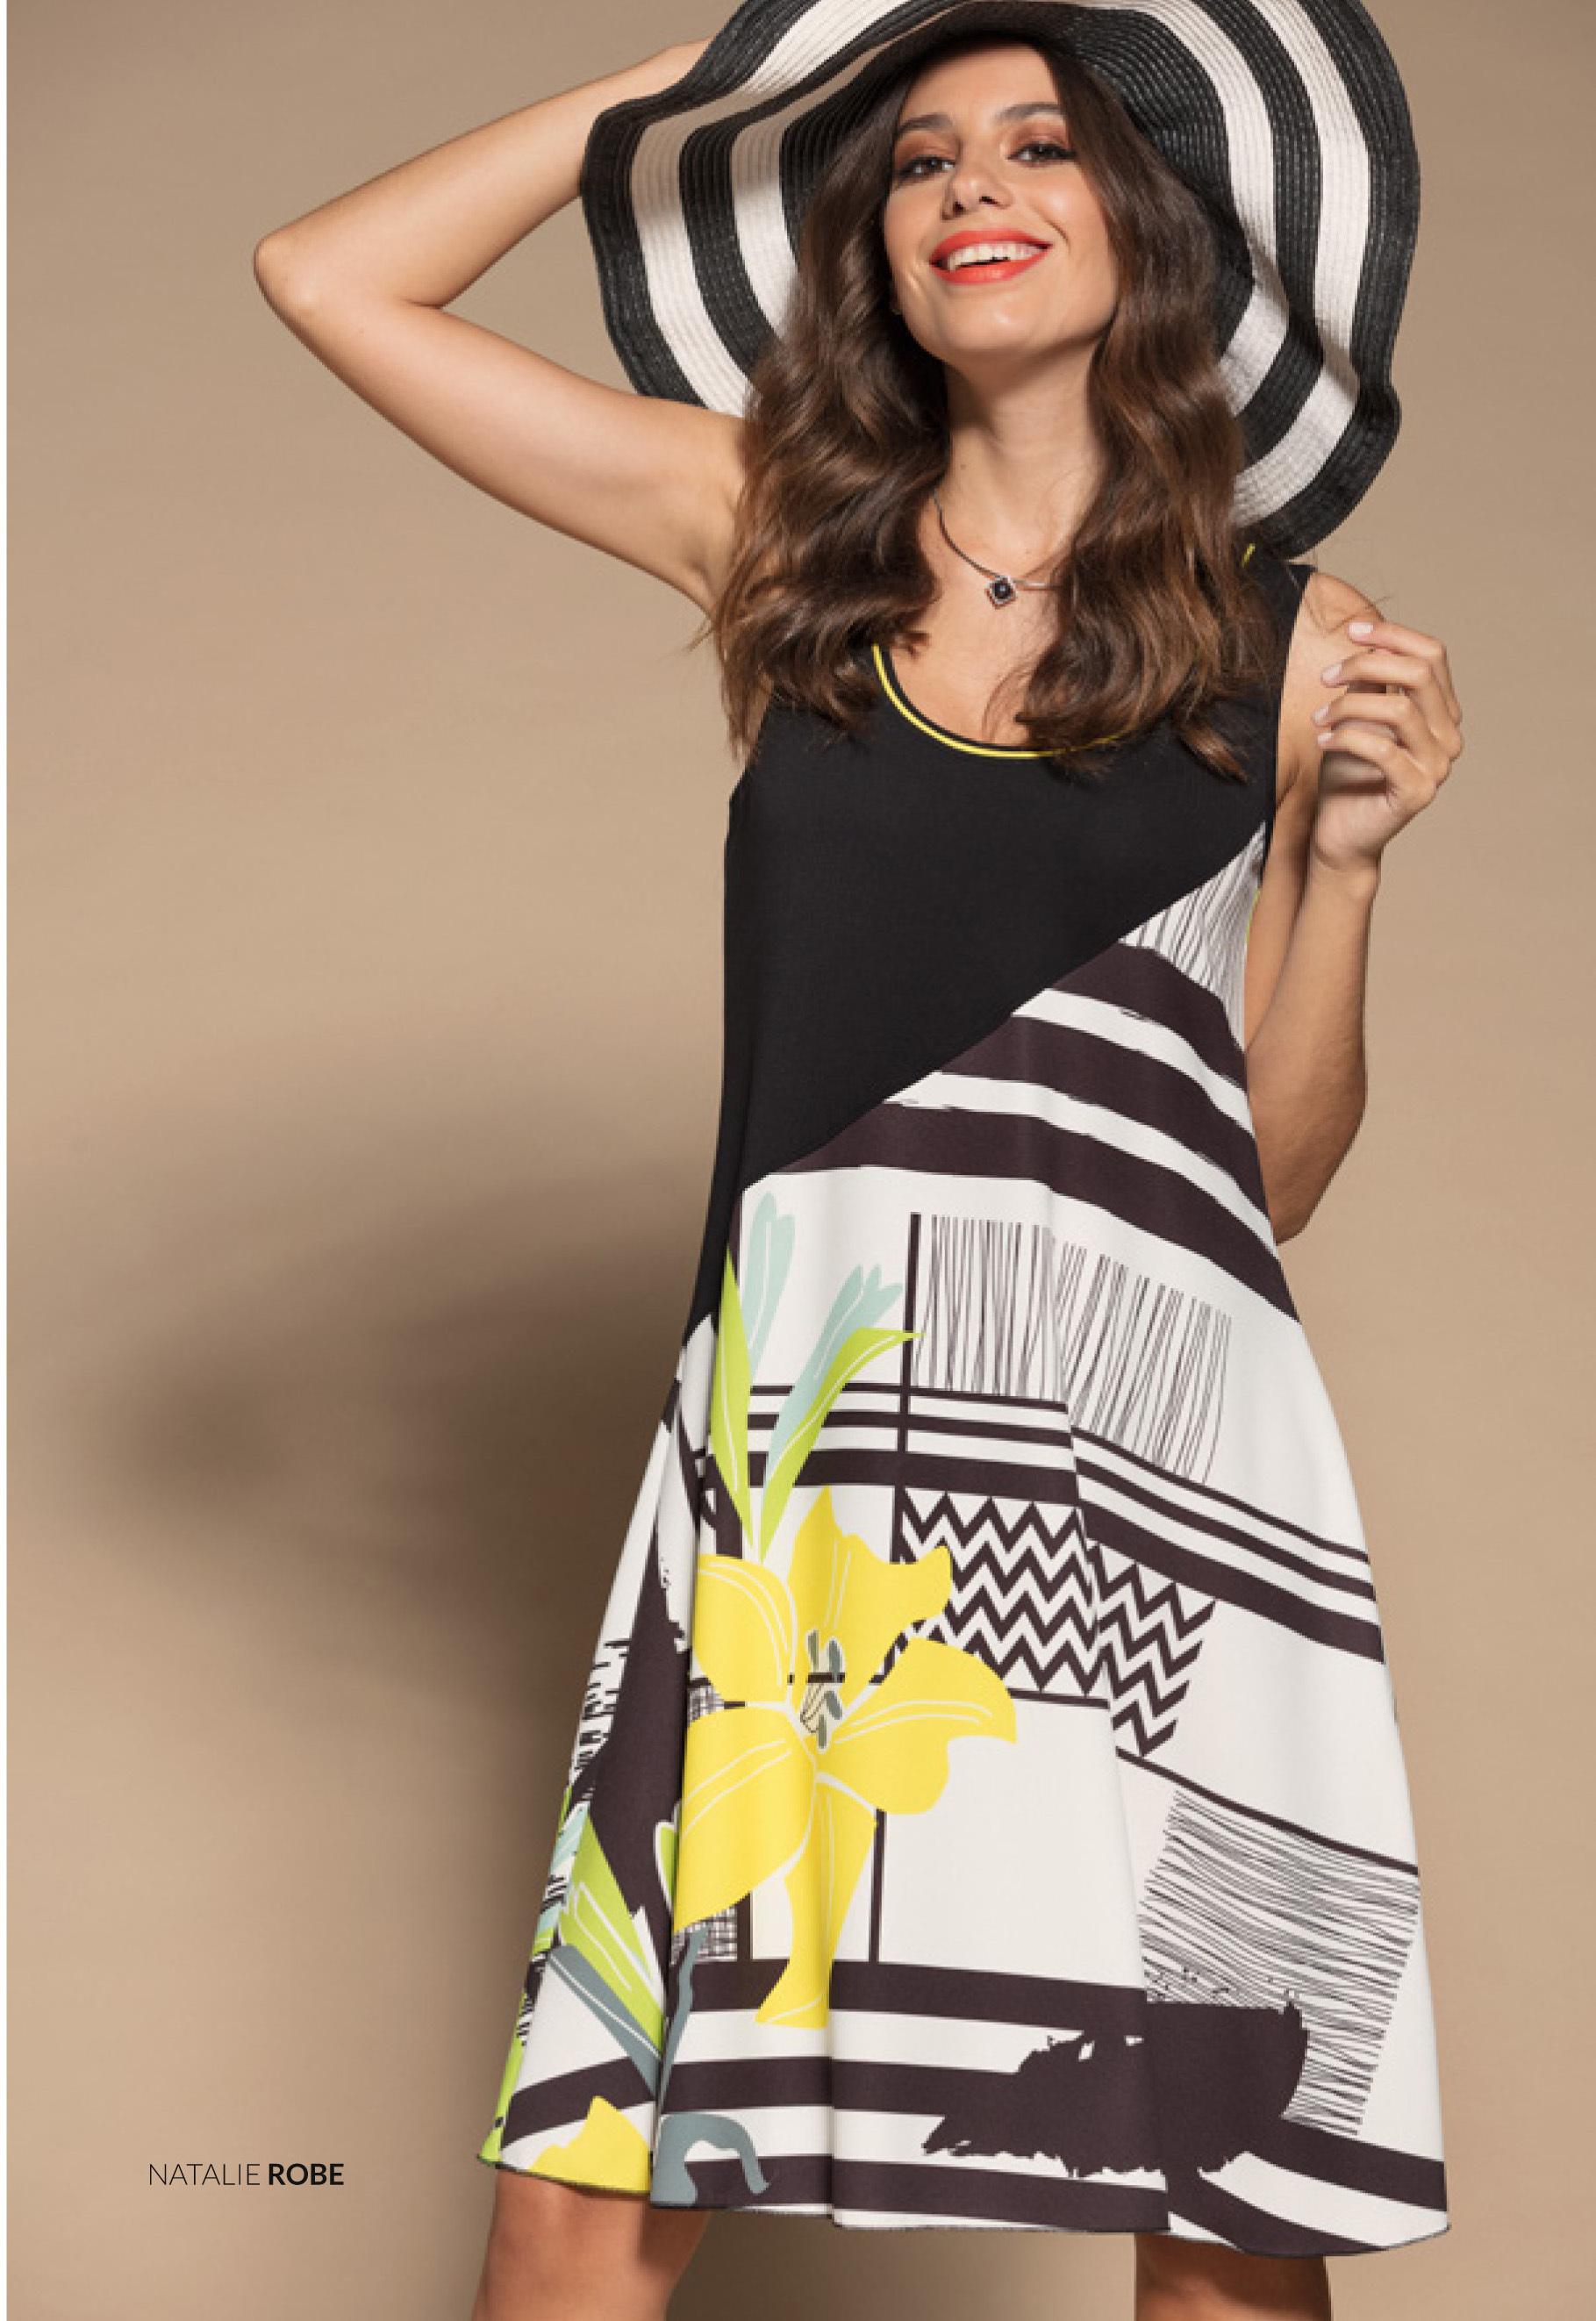 Maloka: Lemon Lime Marble Asymmetrical Bodice Dress/Tunic (Comes In 2 Art Patterns!) MK_NATALIE_N1